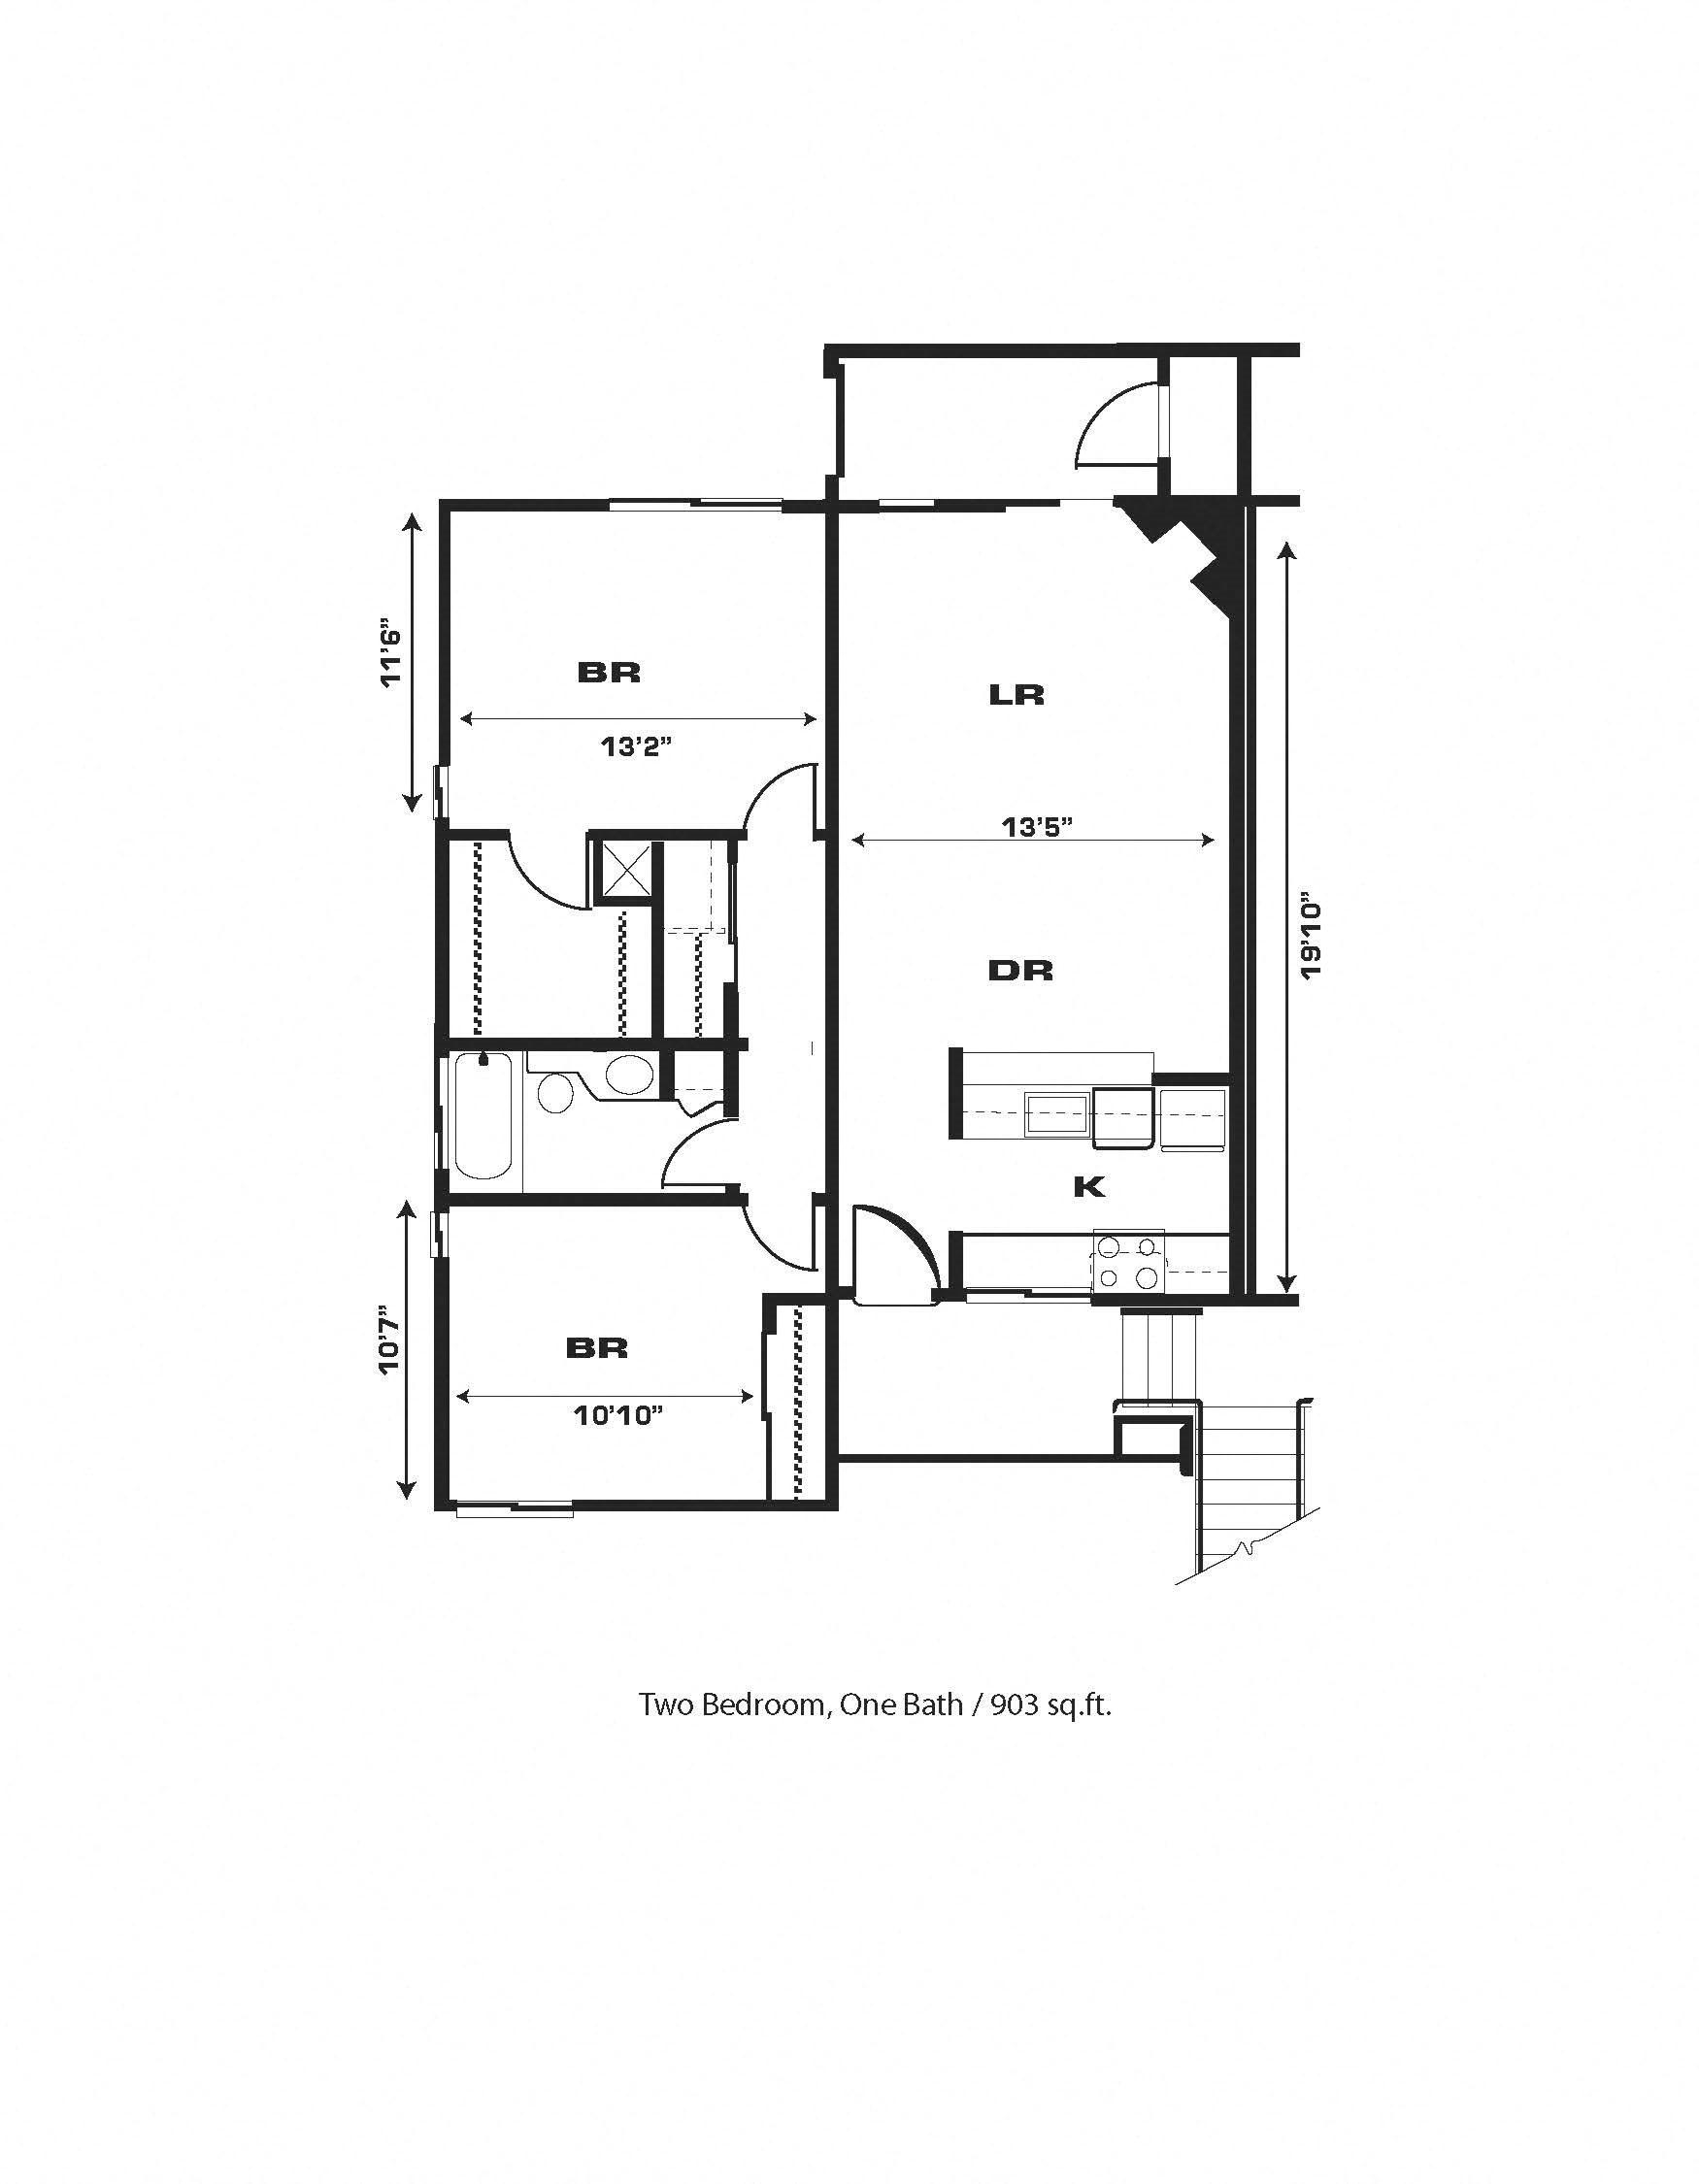 2br/1ba, Fireplace Floor Plan 7